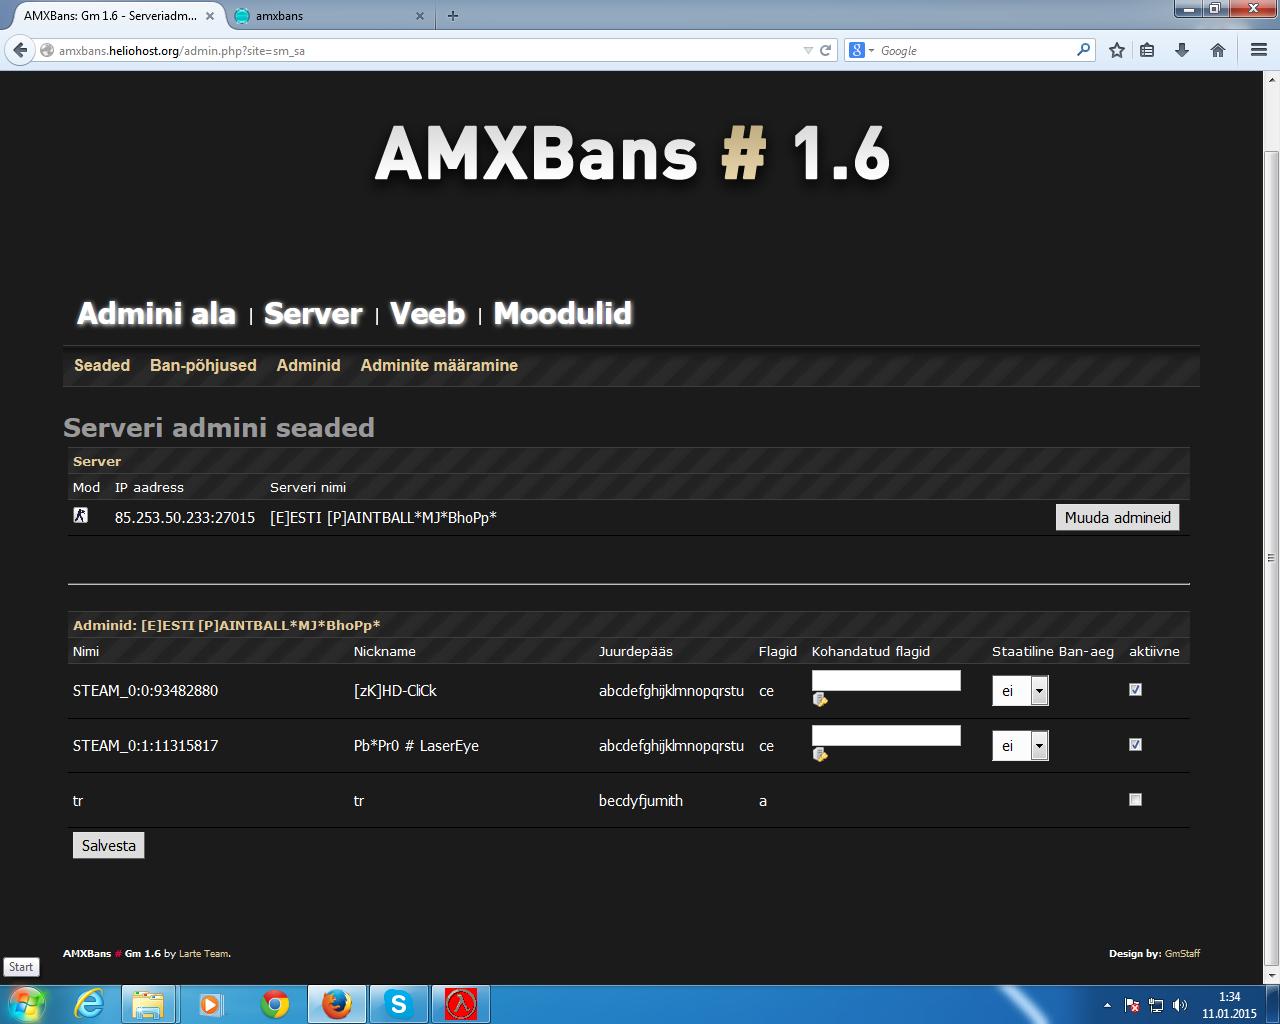 amxbans V4o2li